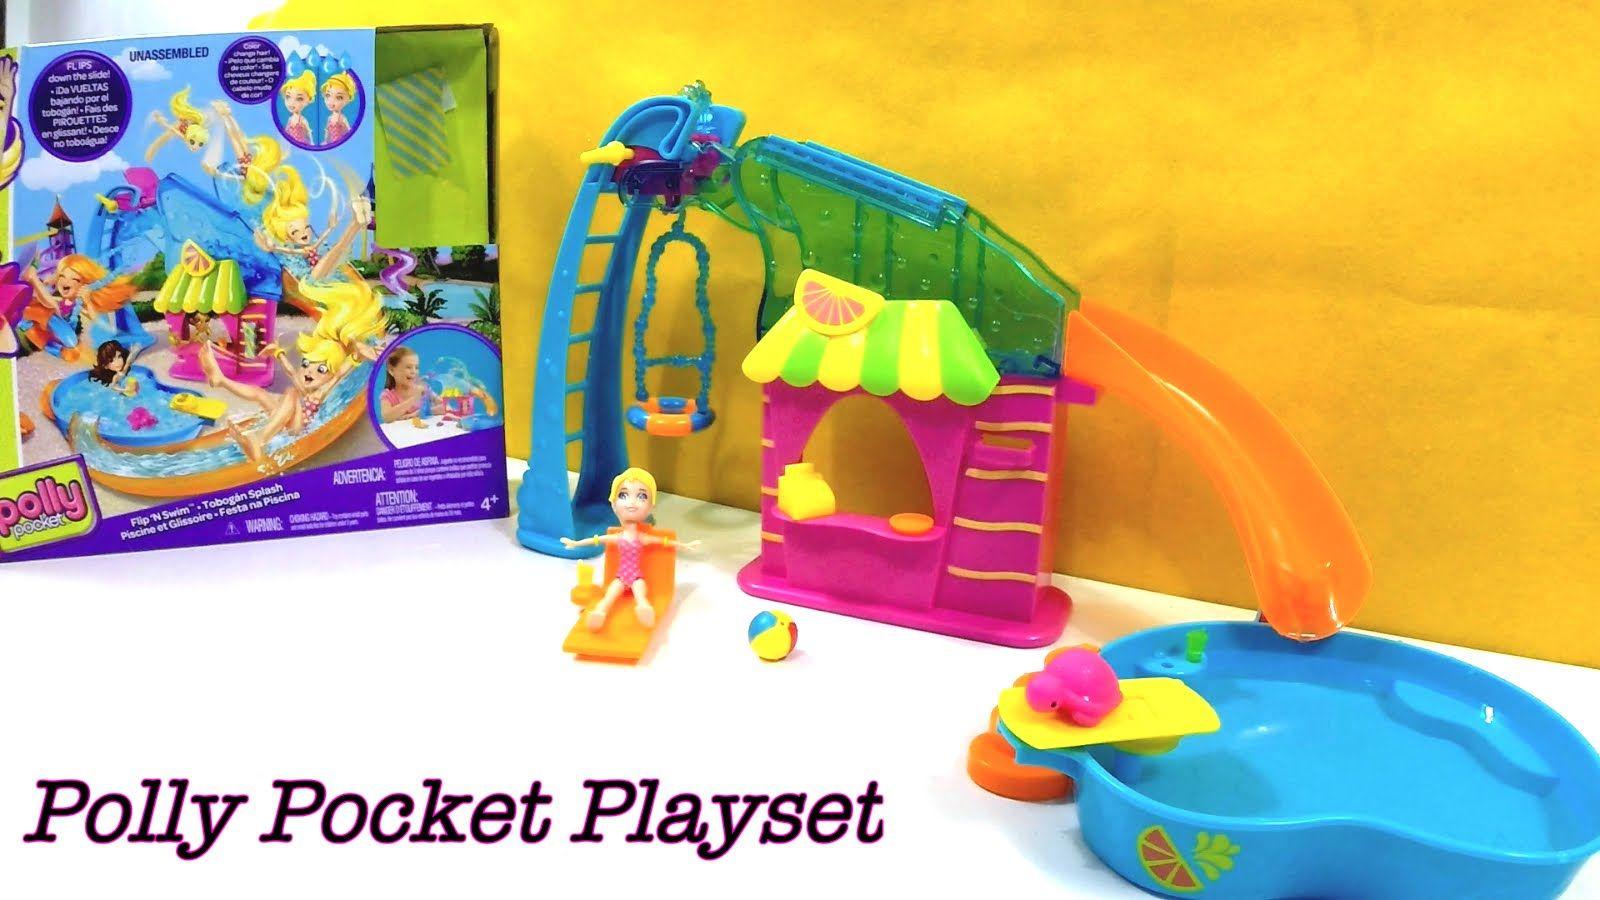 Polly pocket playset festa na piscina flip 39 n swim ou for Piscine polly pocket